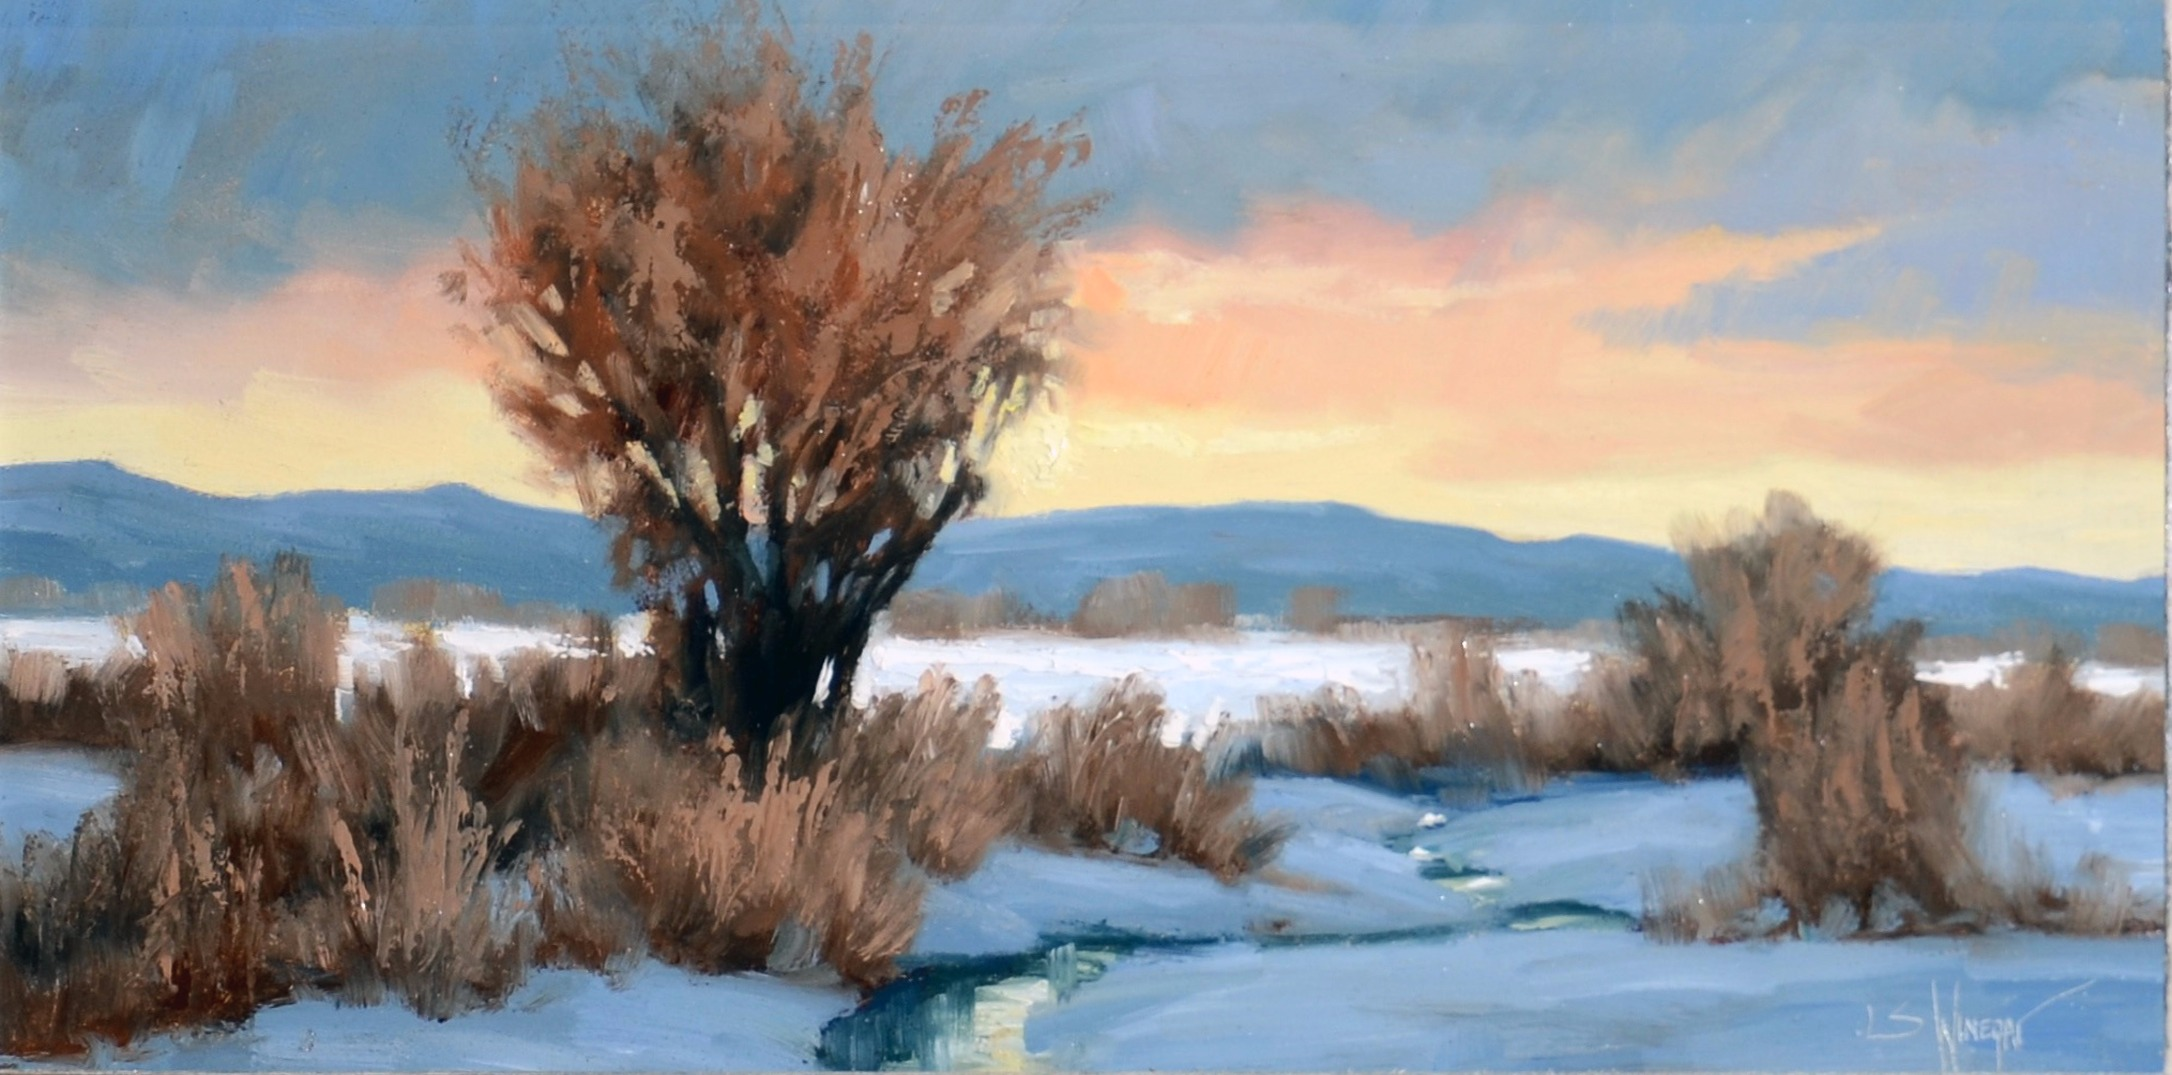 Simon Winegar - Winter Wonder